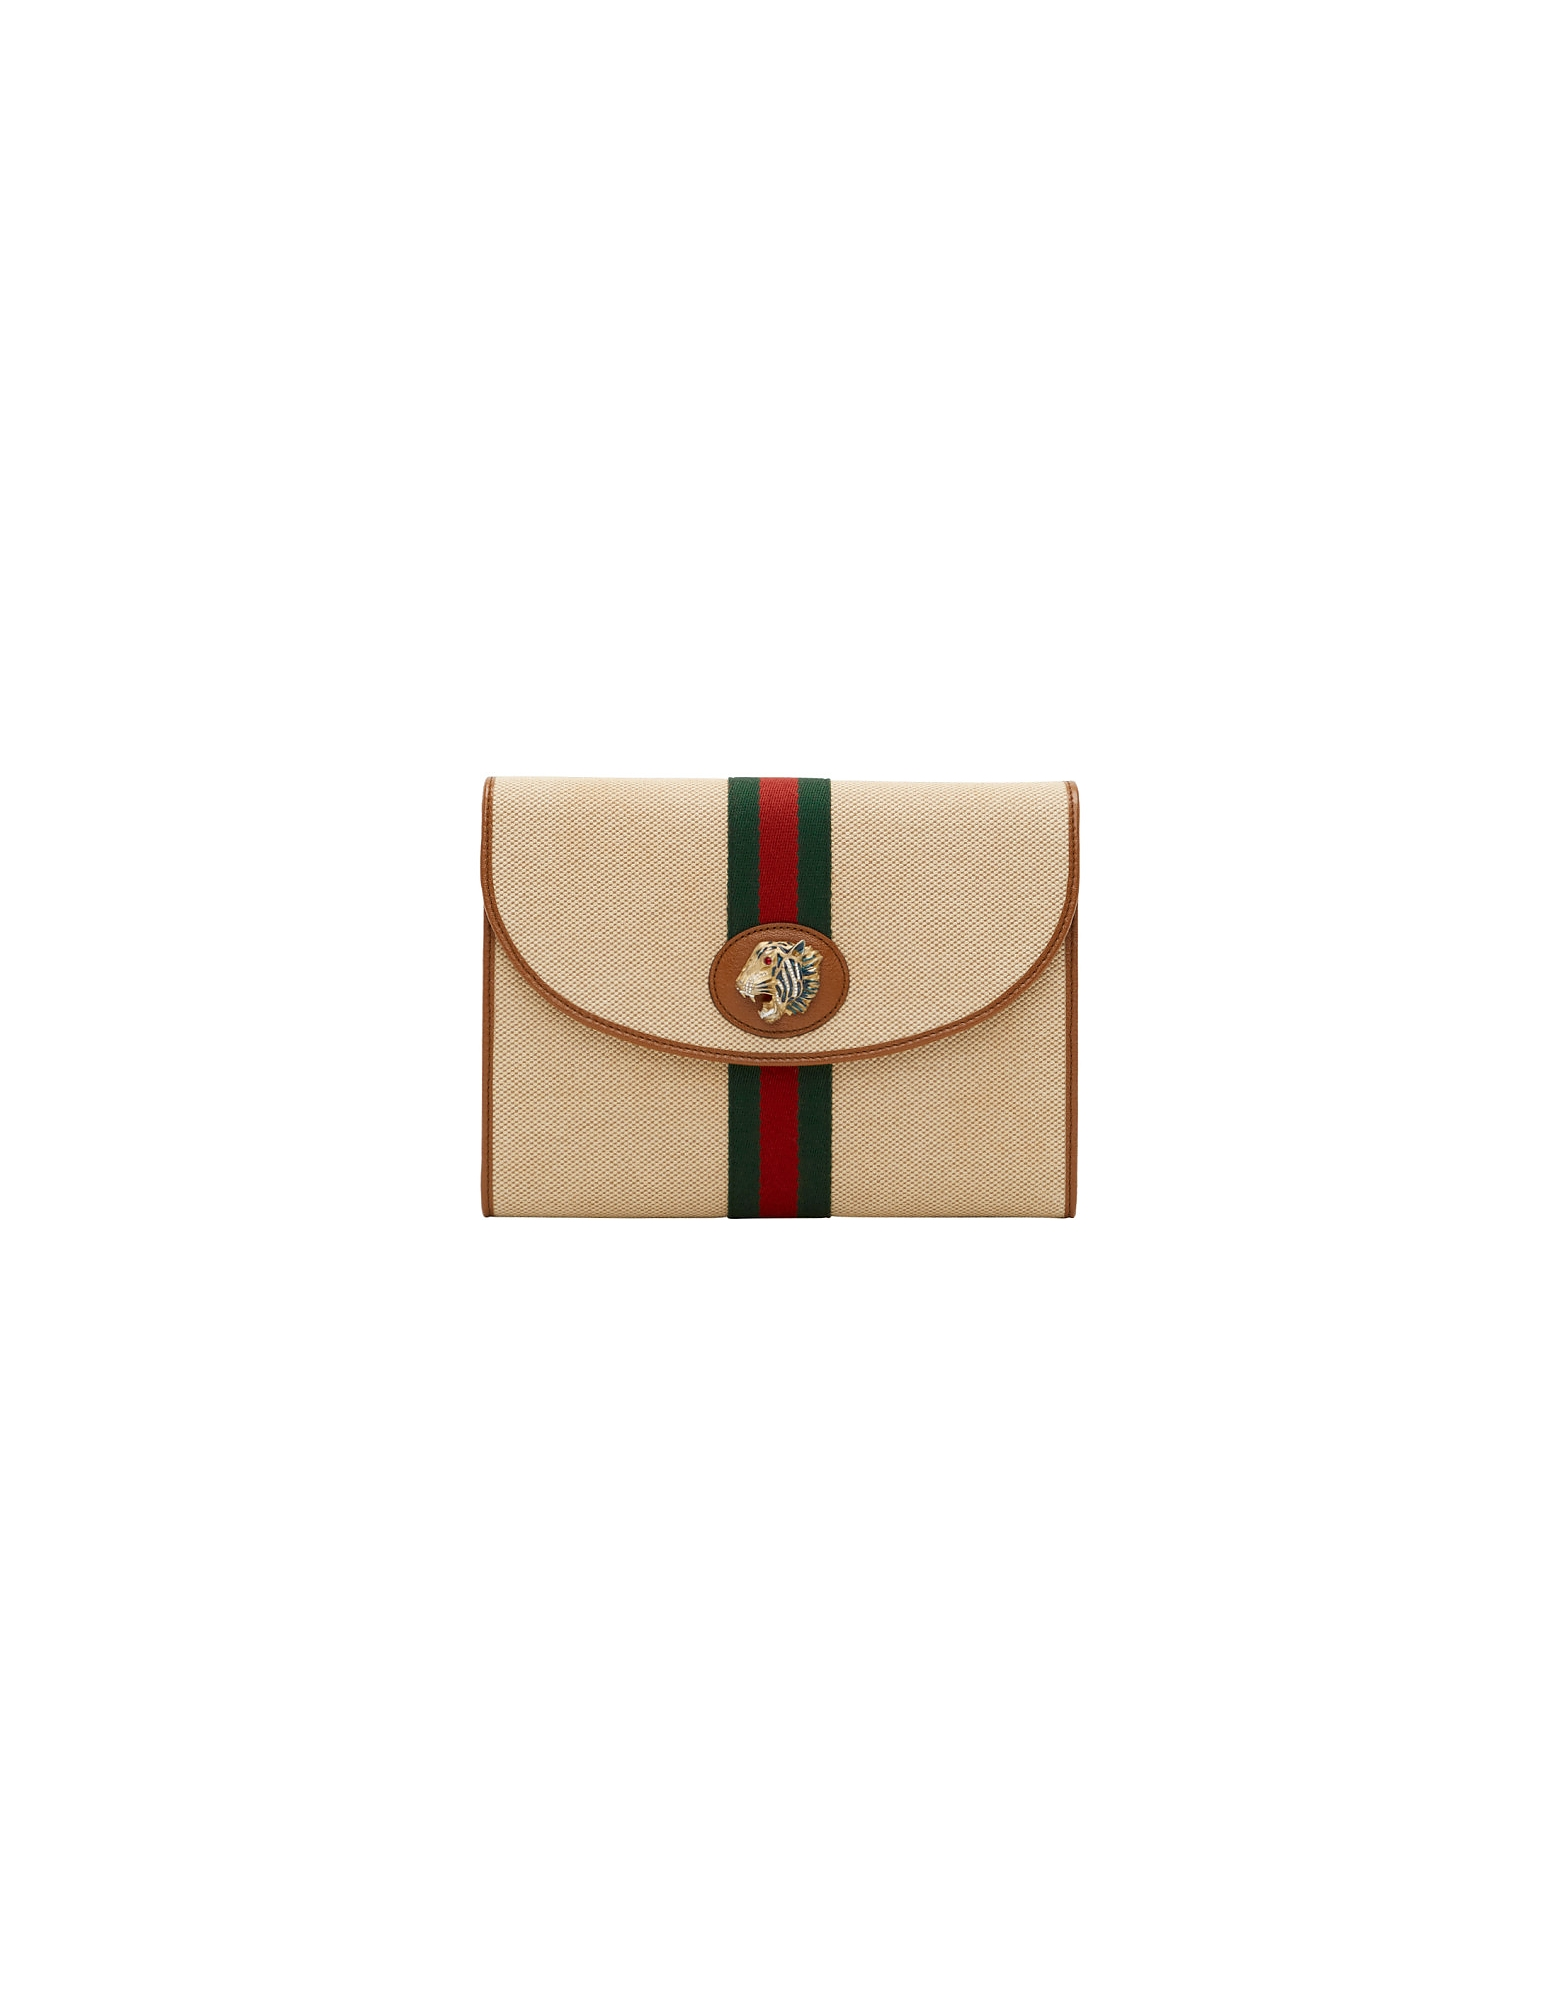 Gucci Designer Handbags, Beige Rajah Canvas Pouch